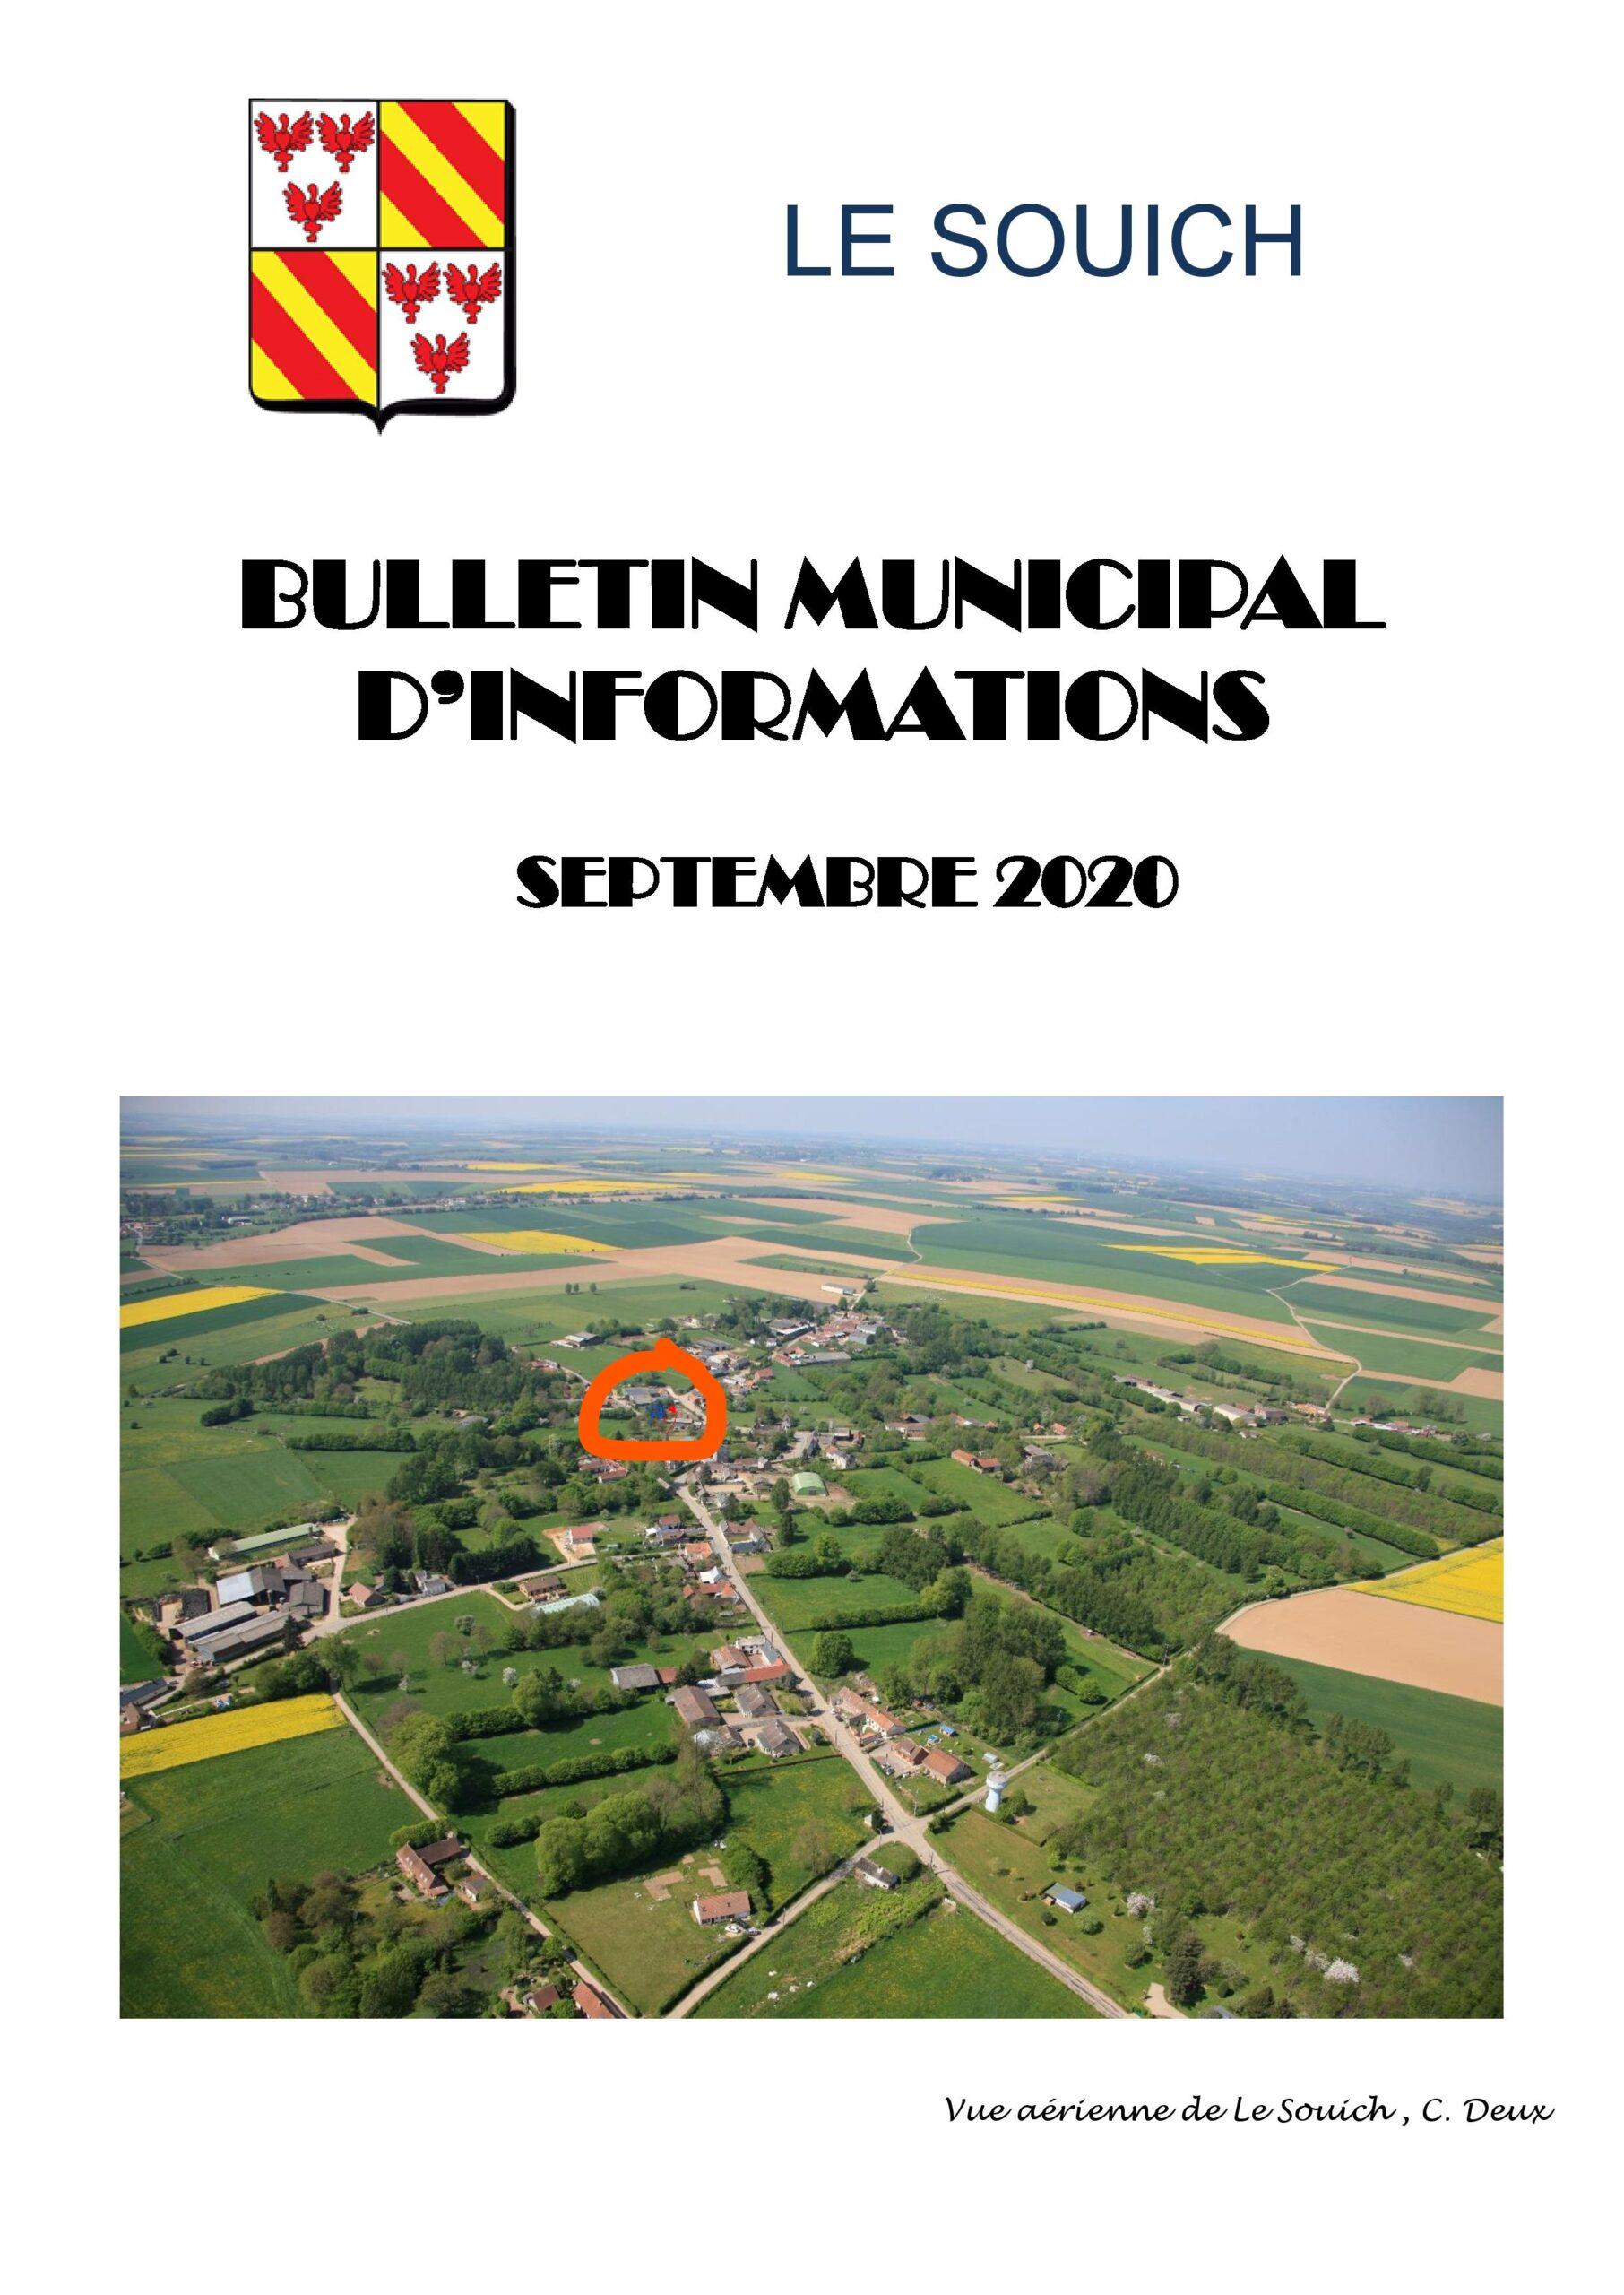 Inkedbulletin municipal septembre 2020-page-001_LI